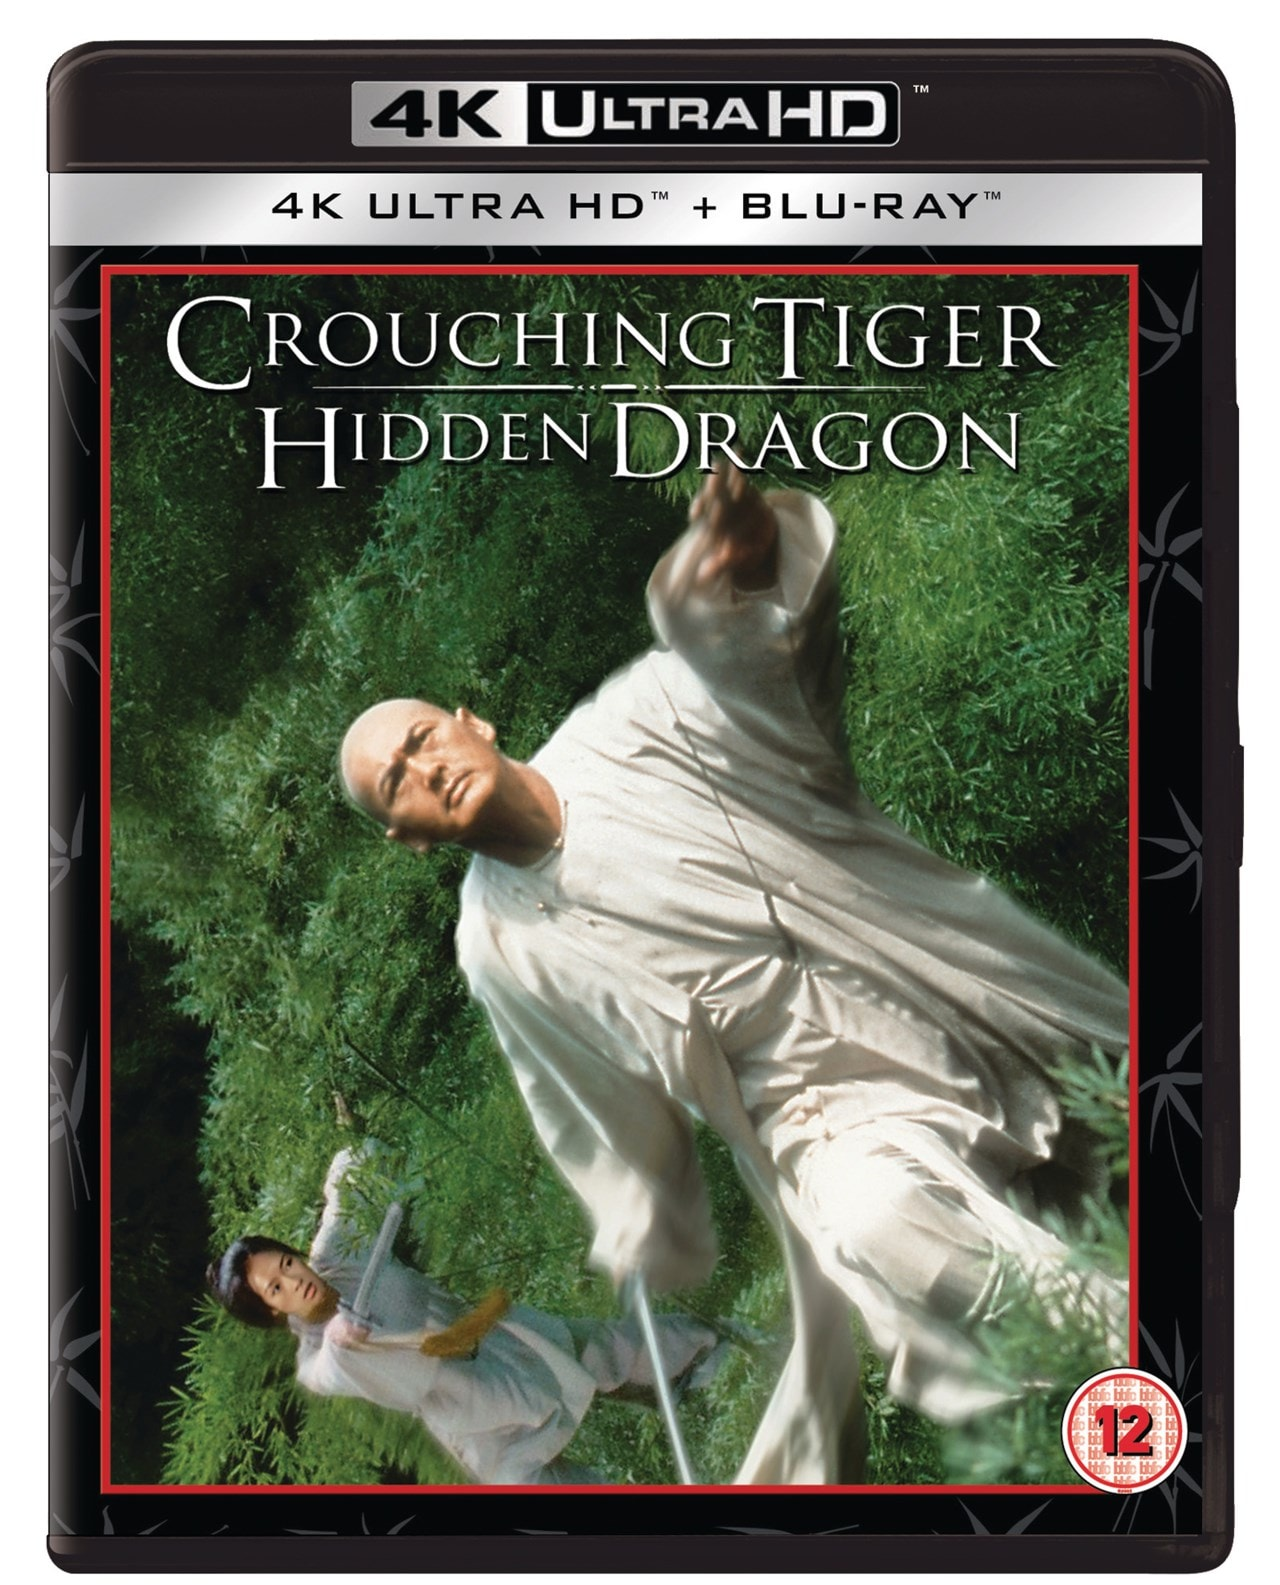 Crouching Tiger, Hidden Dragon - 1